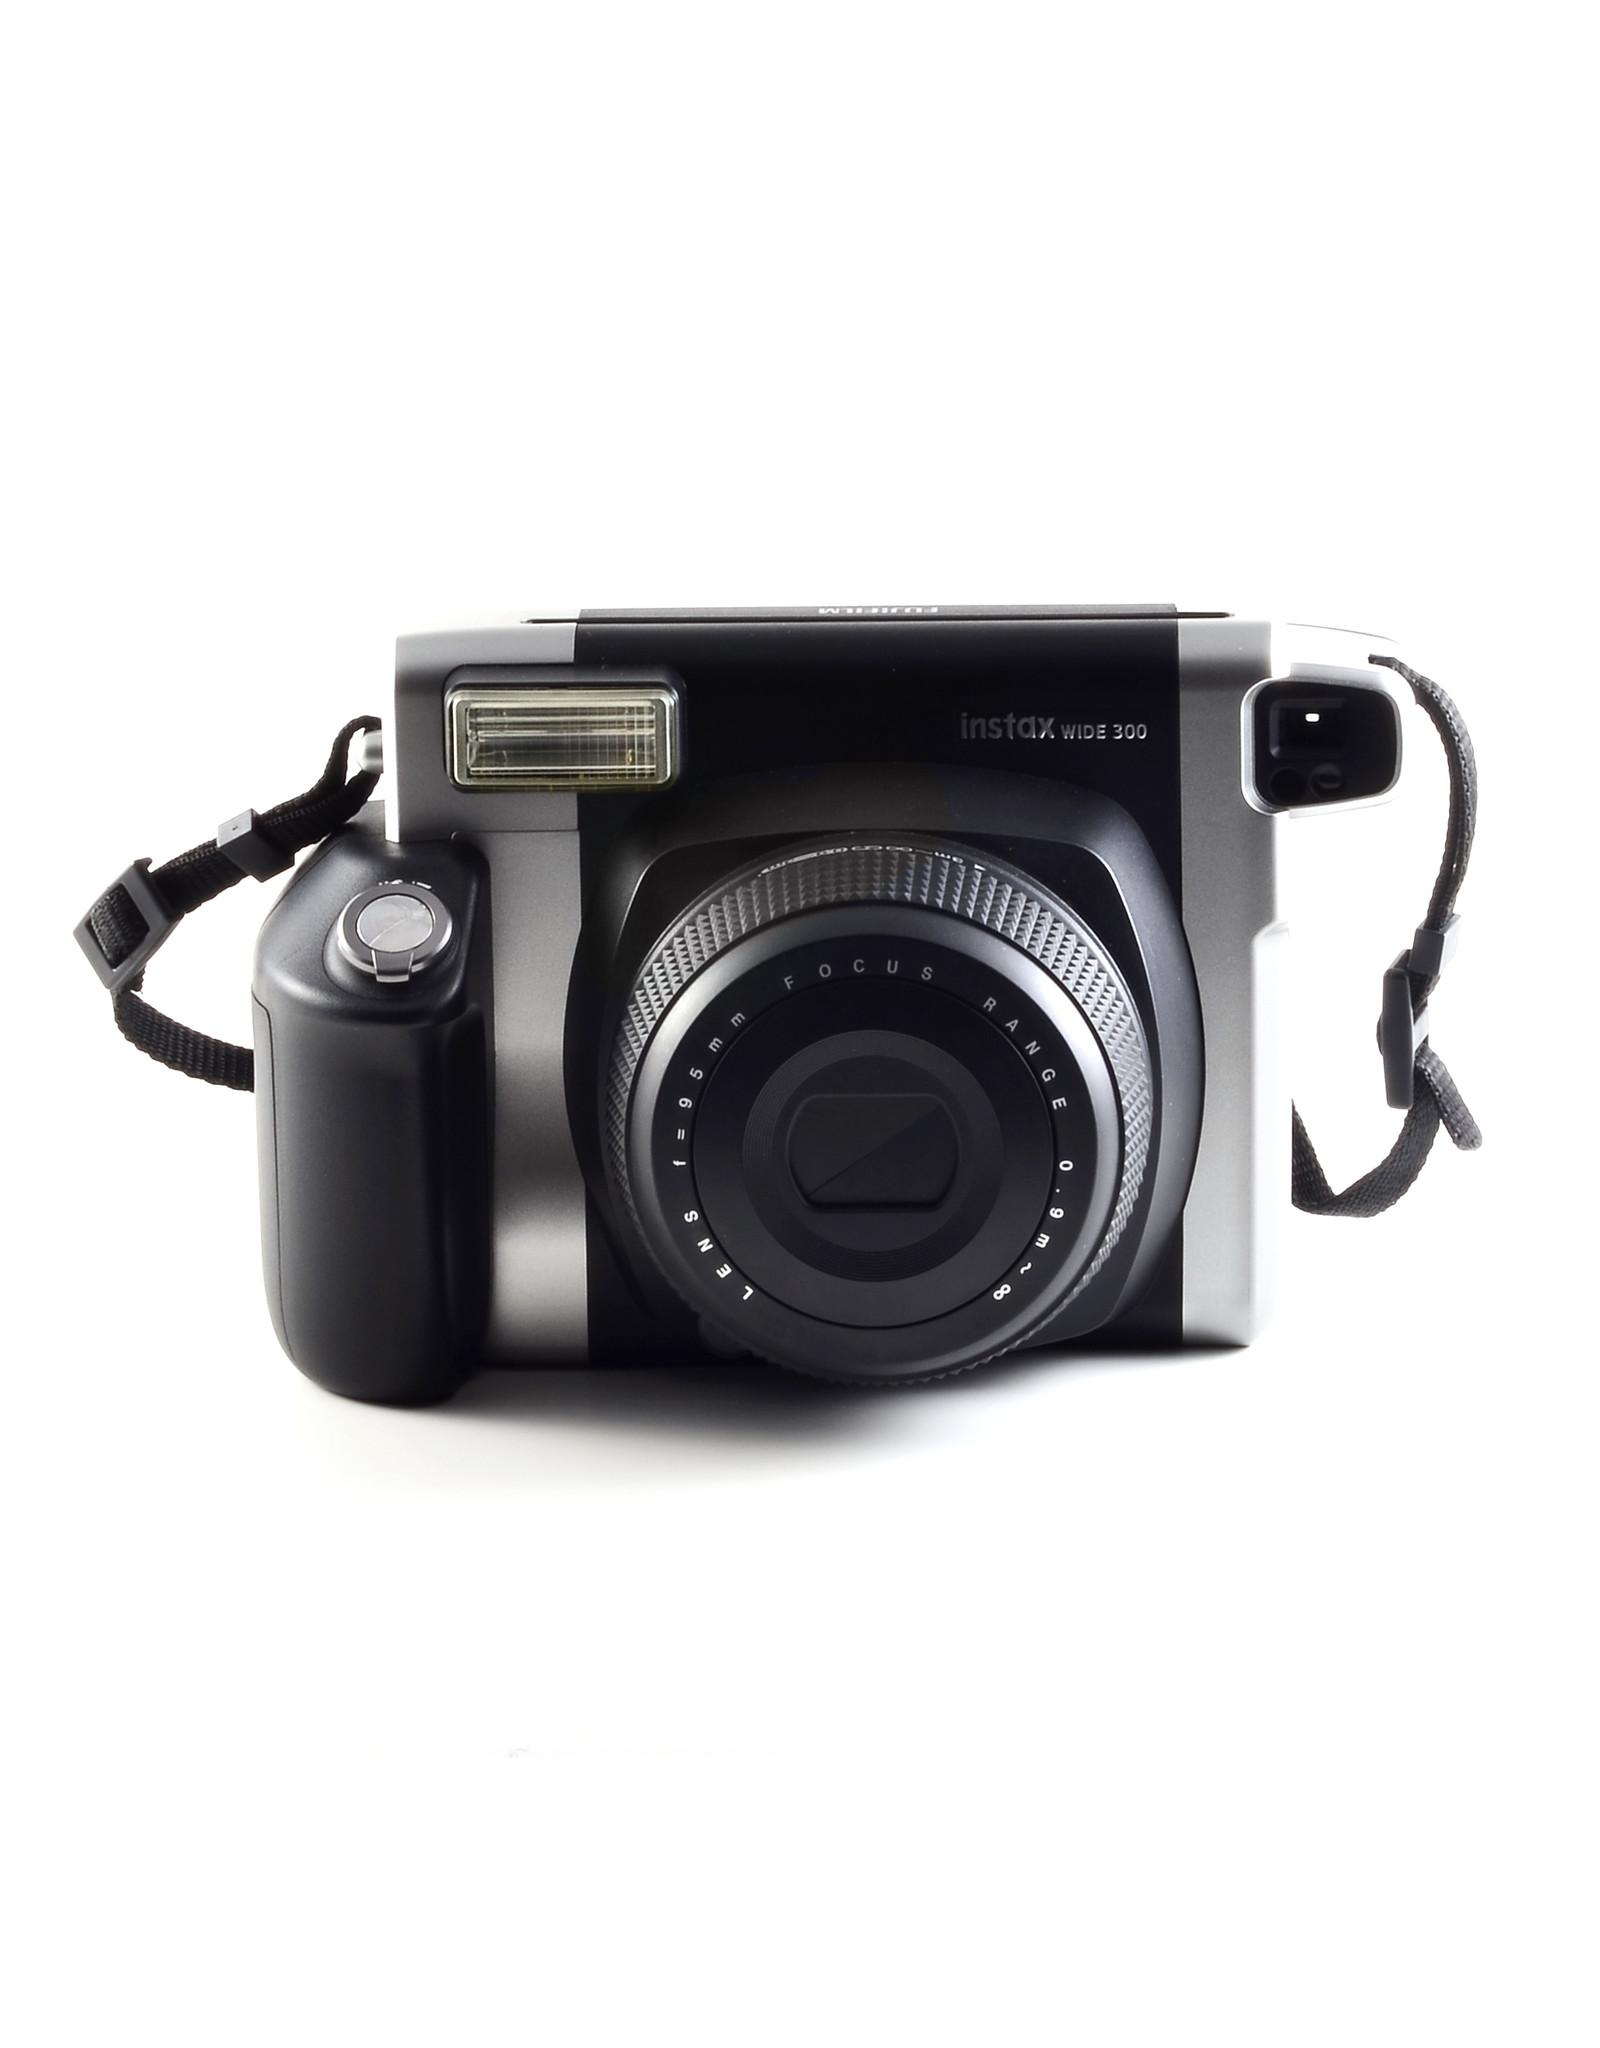 Fujifilm Miete Fujifilm Instax Wide 300